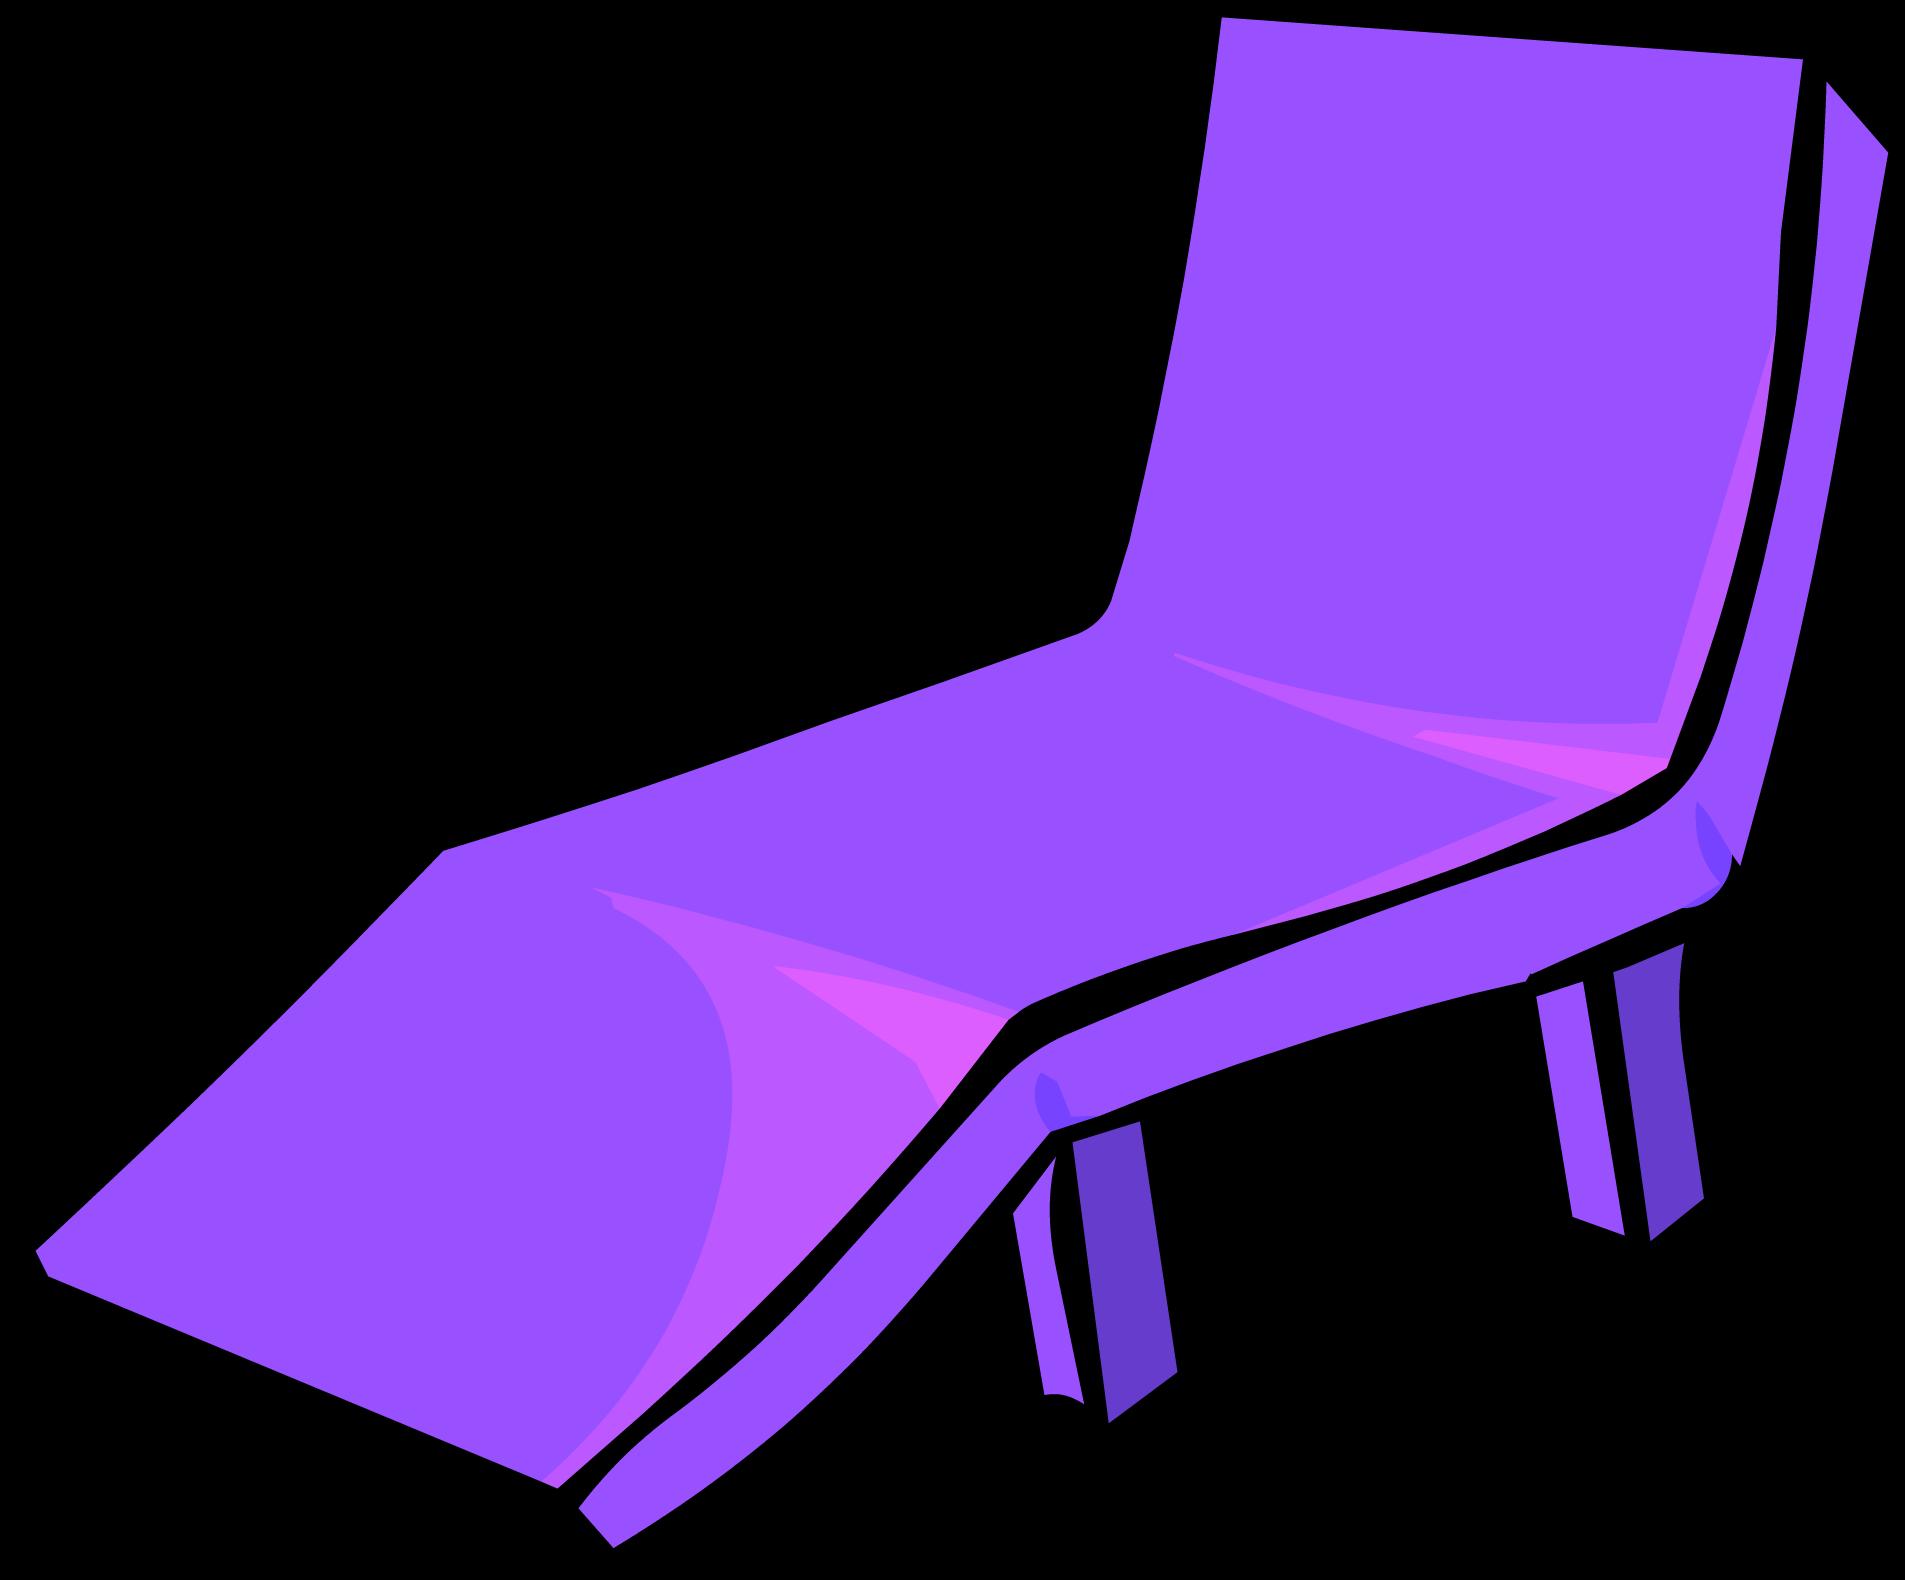 Furniture clipart purple chair. Image plastic lawn sprite